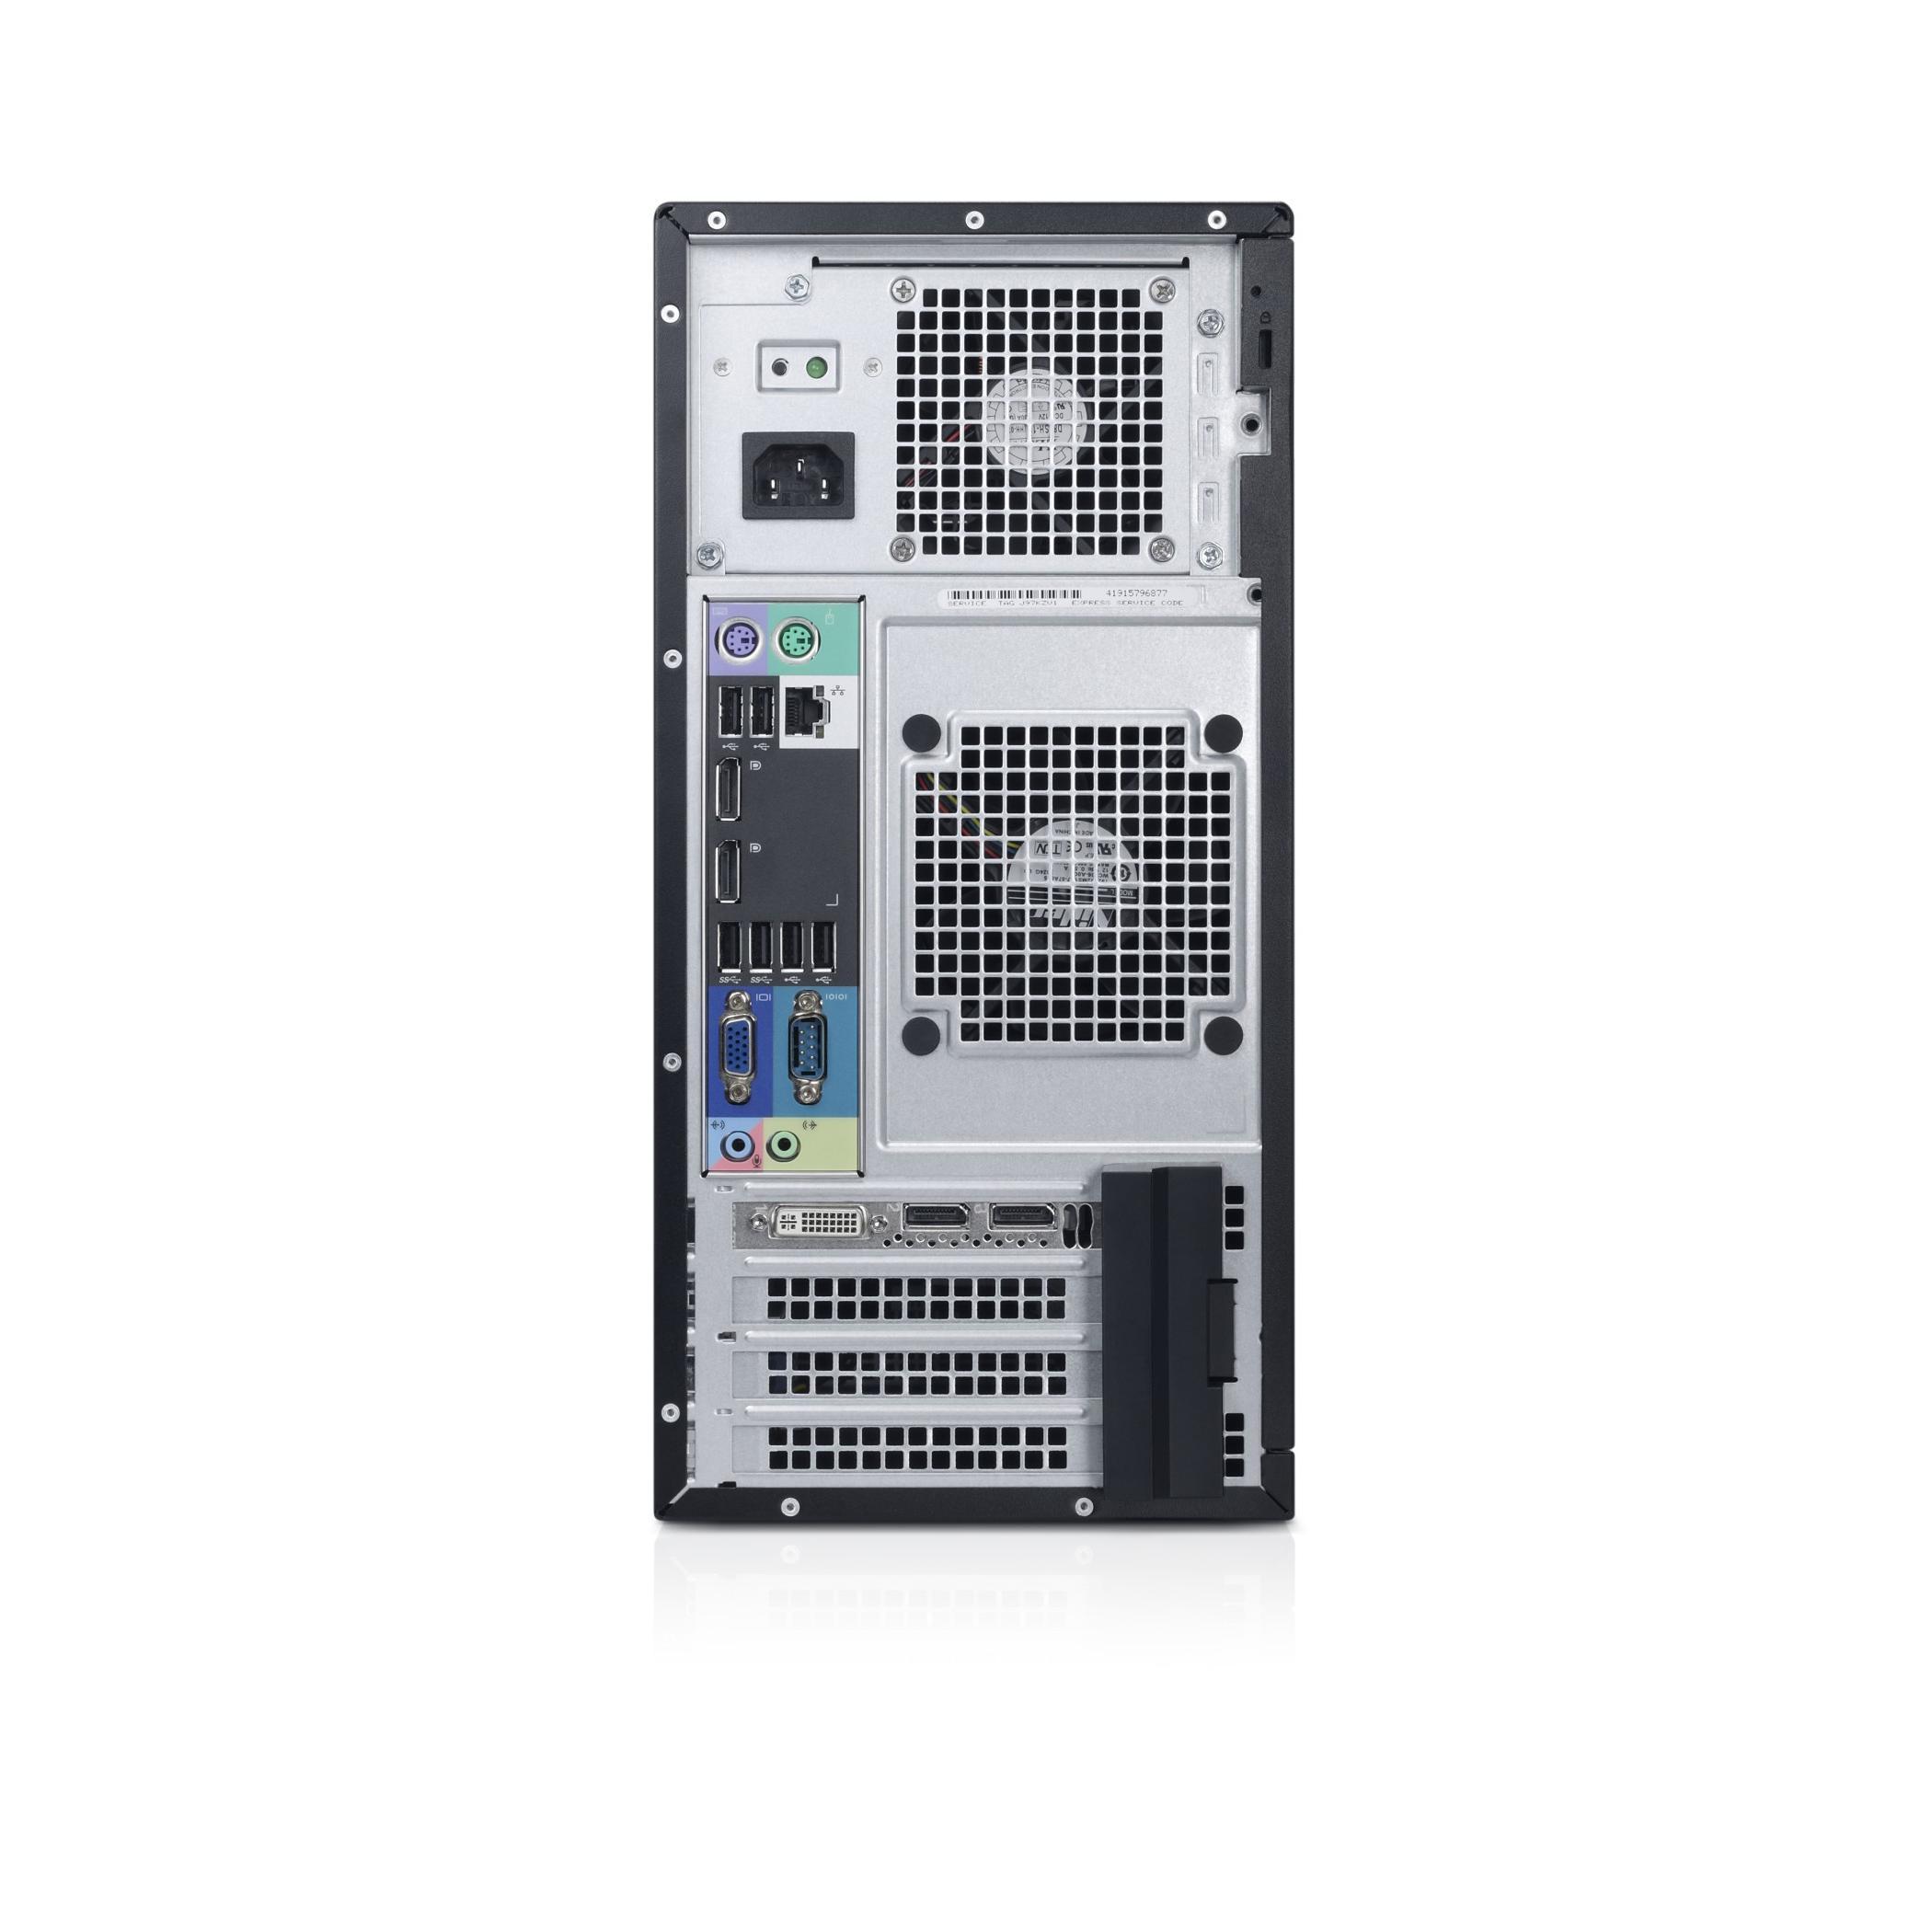 Dell Precision T1700 Core i5 3,2 GHz - HDD 1 To RAM 8 Go